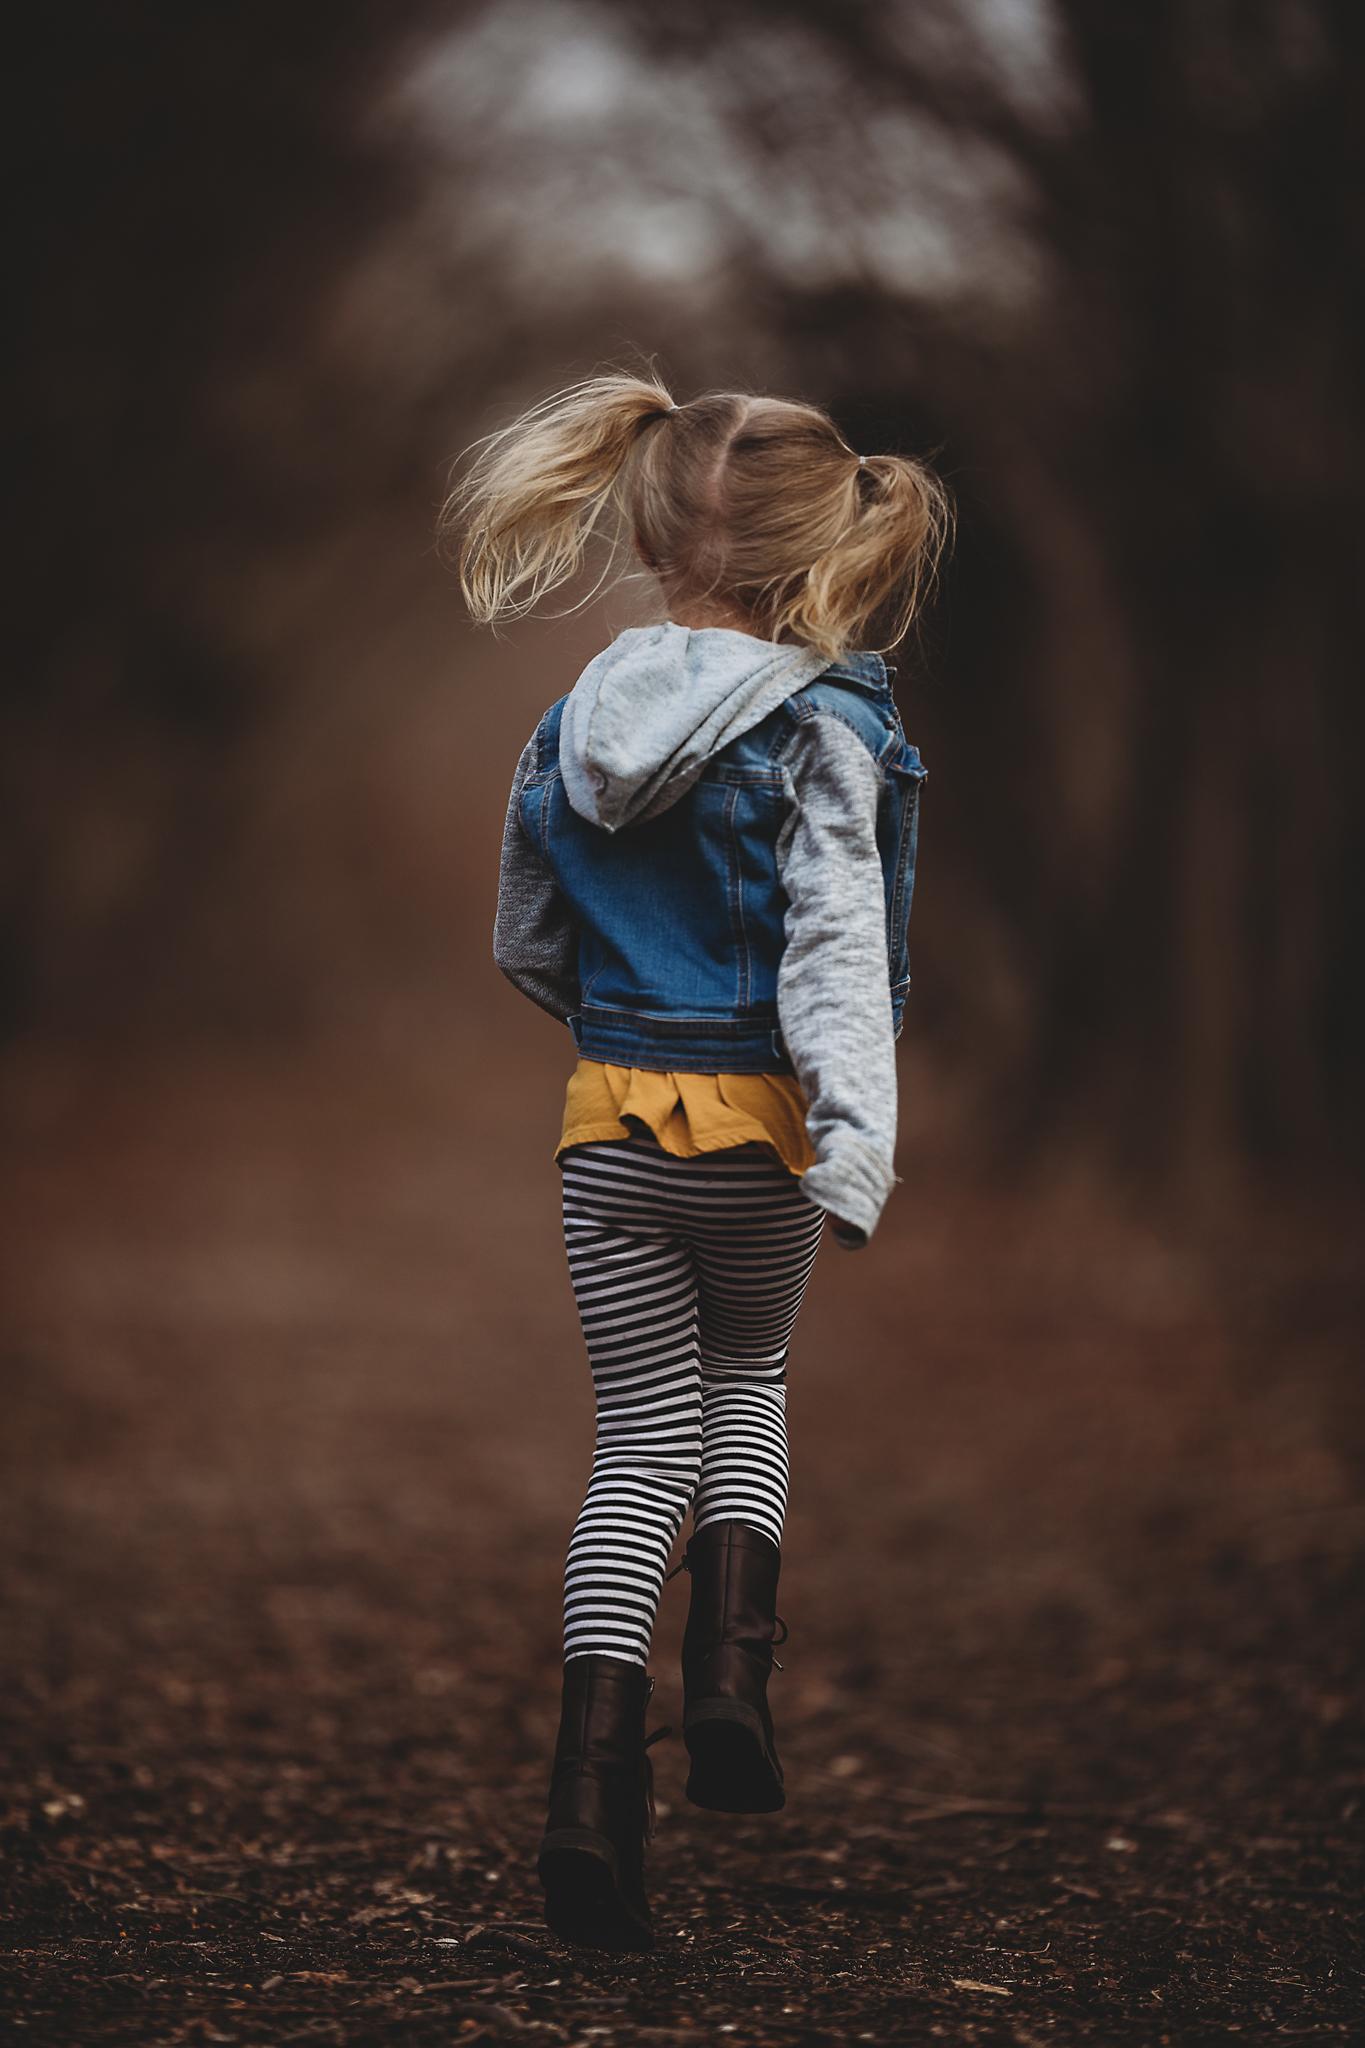 Long-island-photographer-hello-olivia-photography-children-kids-photos-new-york-lifestyle-portraits-suffolk-County-LI-46.jpg